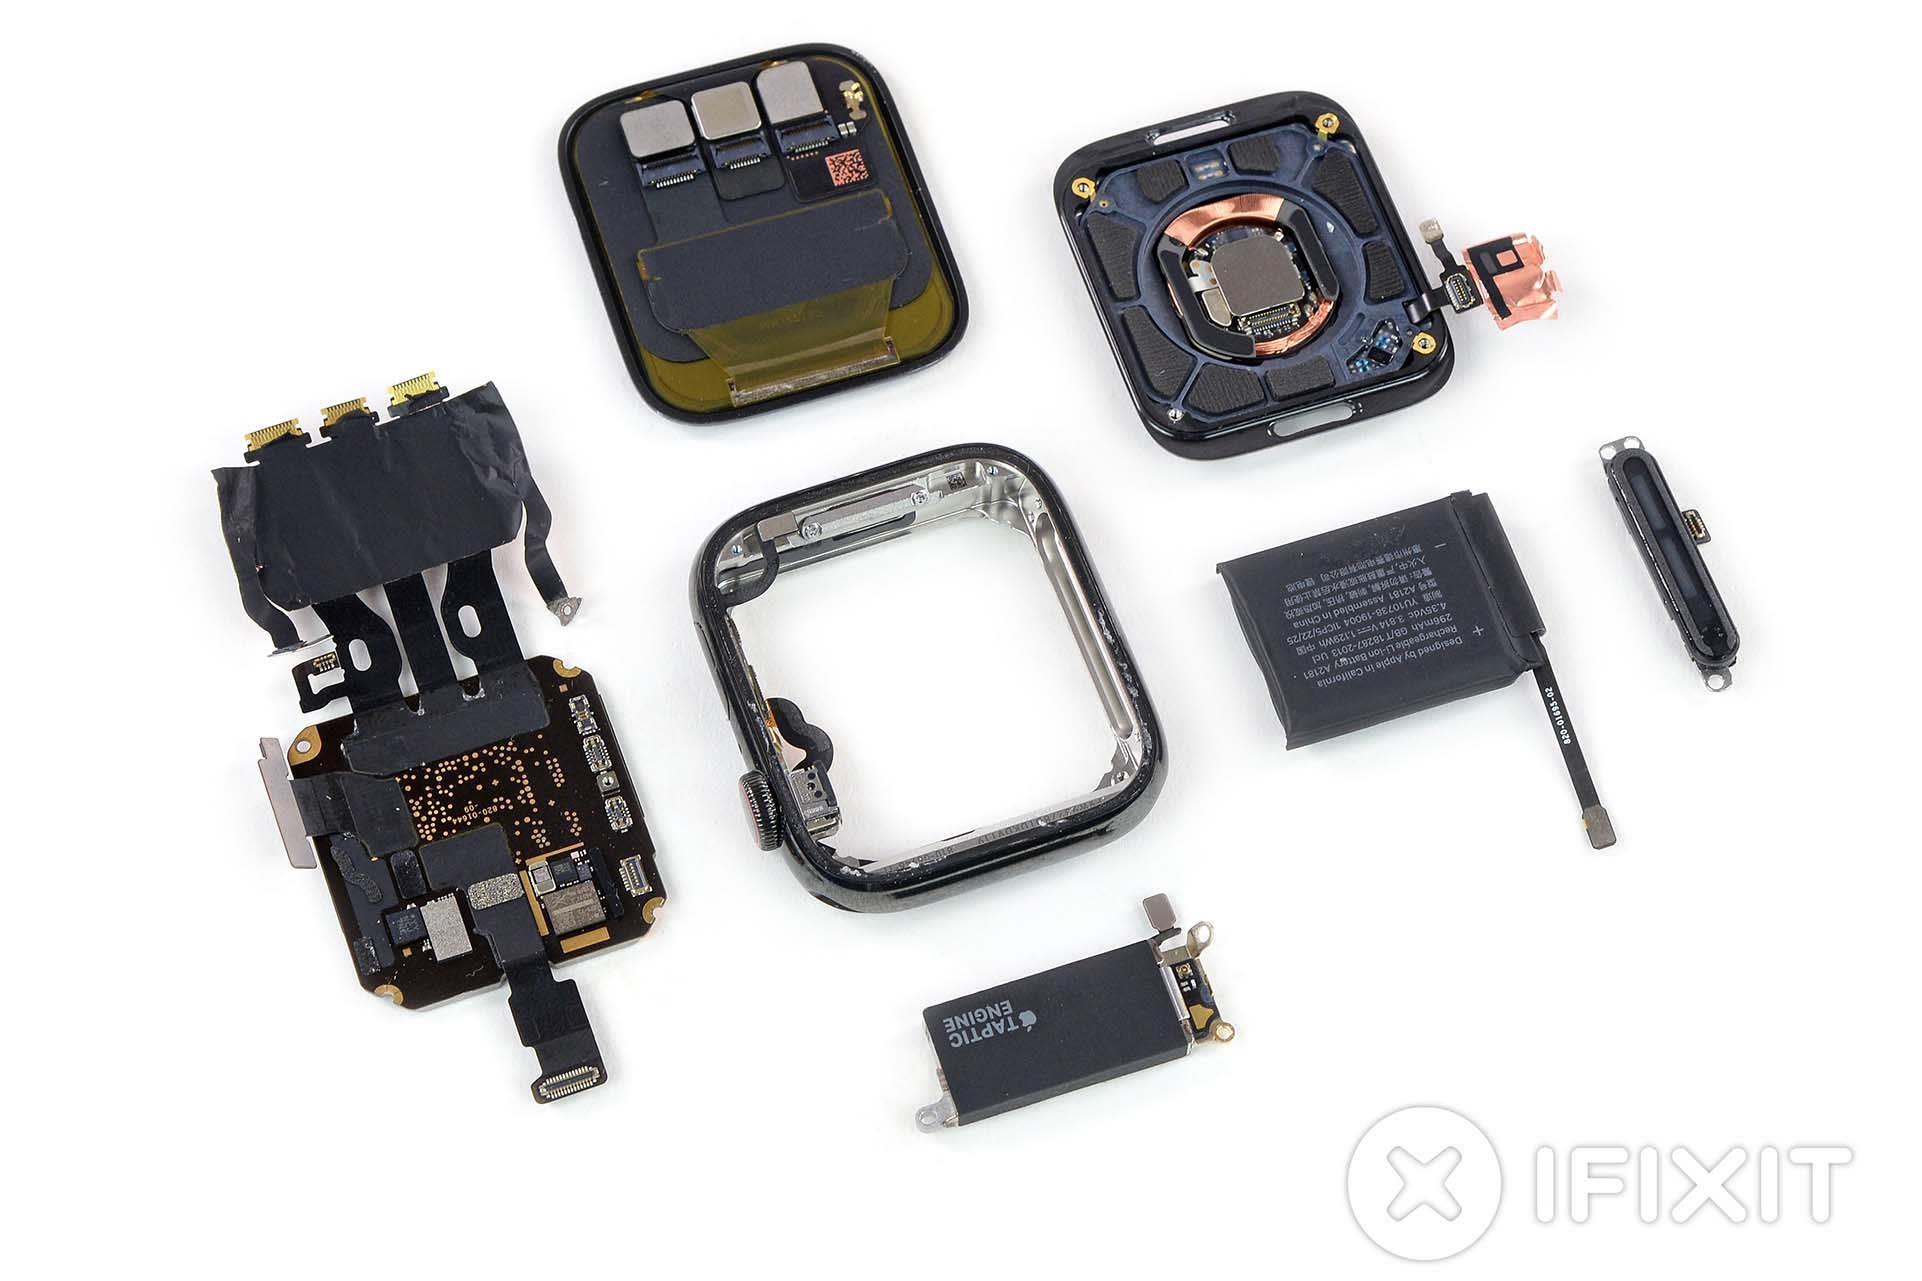 iFixitがApple Watch Series 5を分解。Series 4とほぼ同じながら細かな変更 - Engadget 日本版